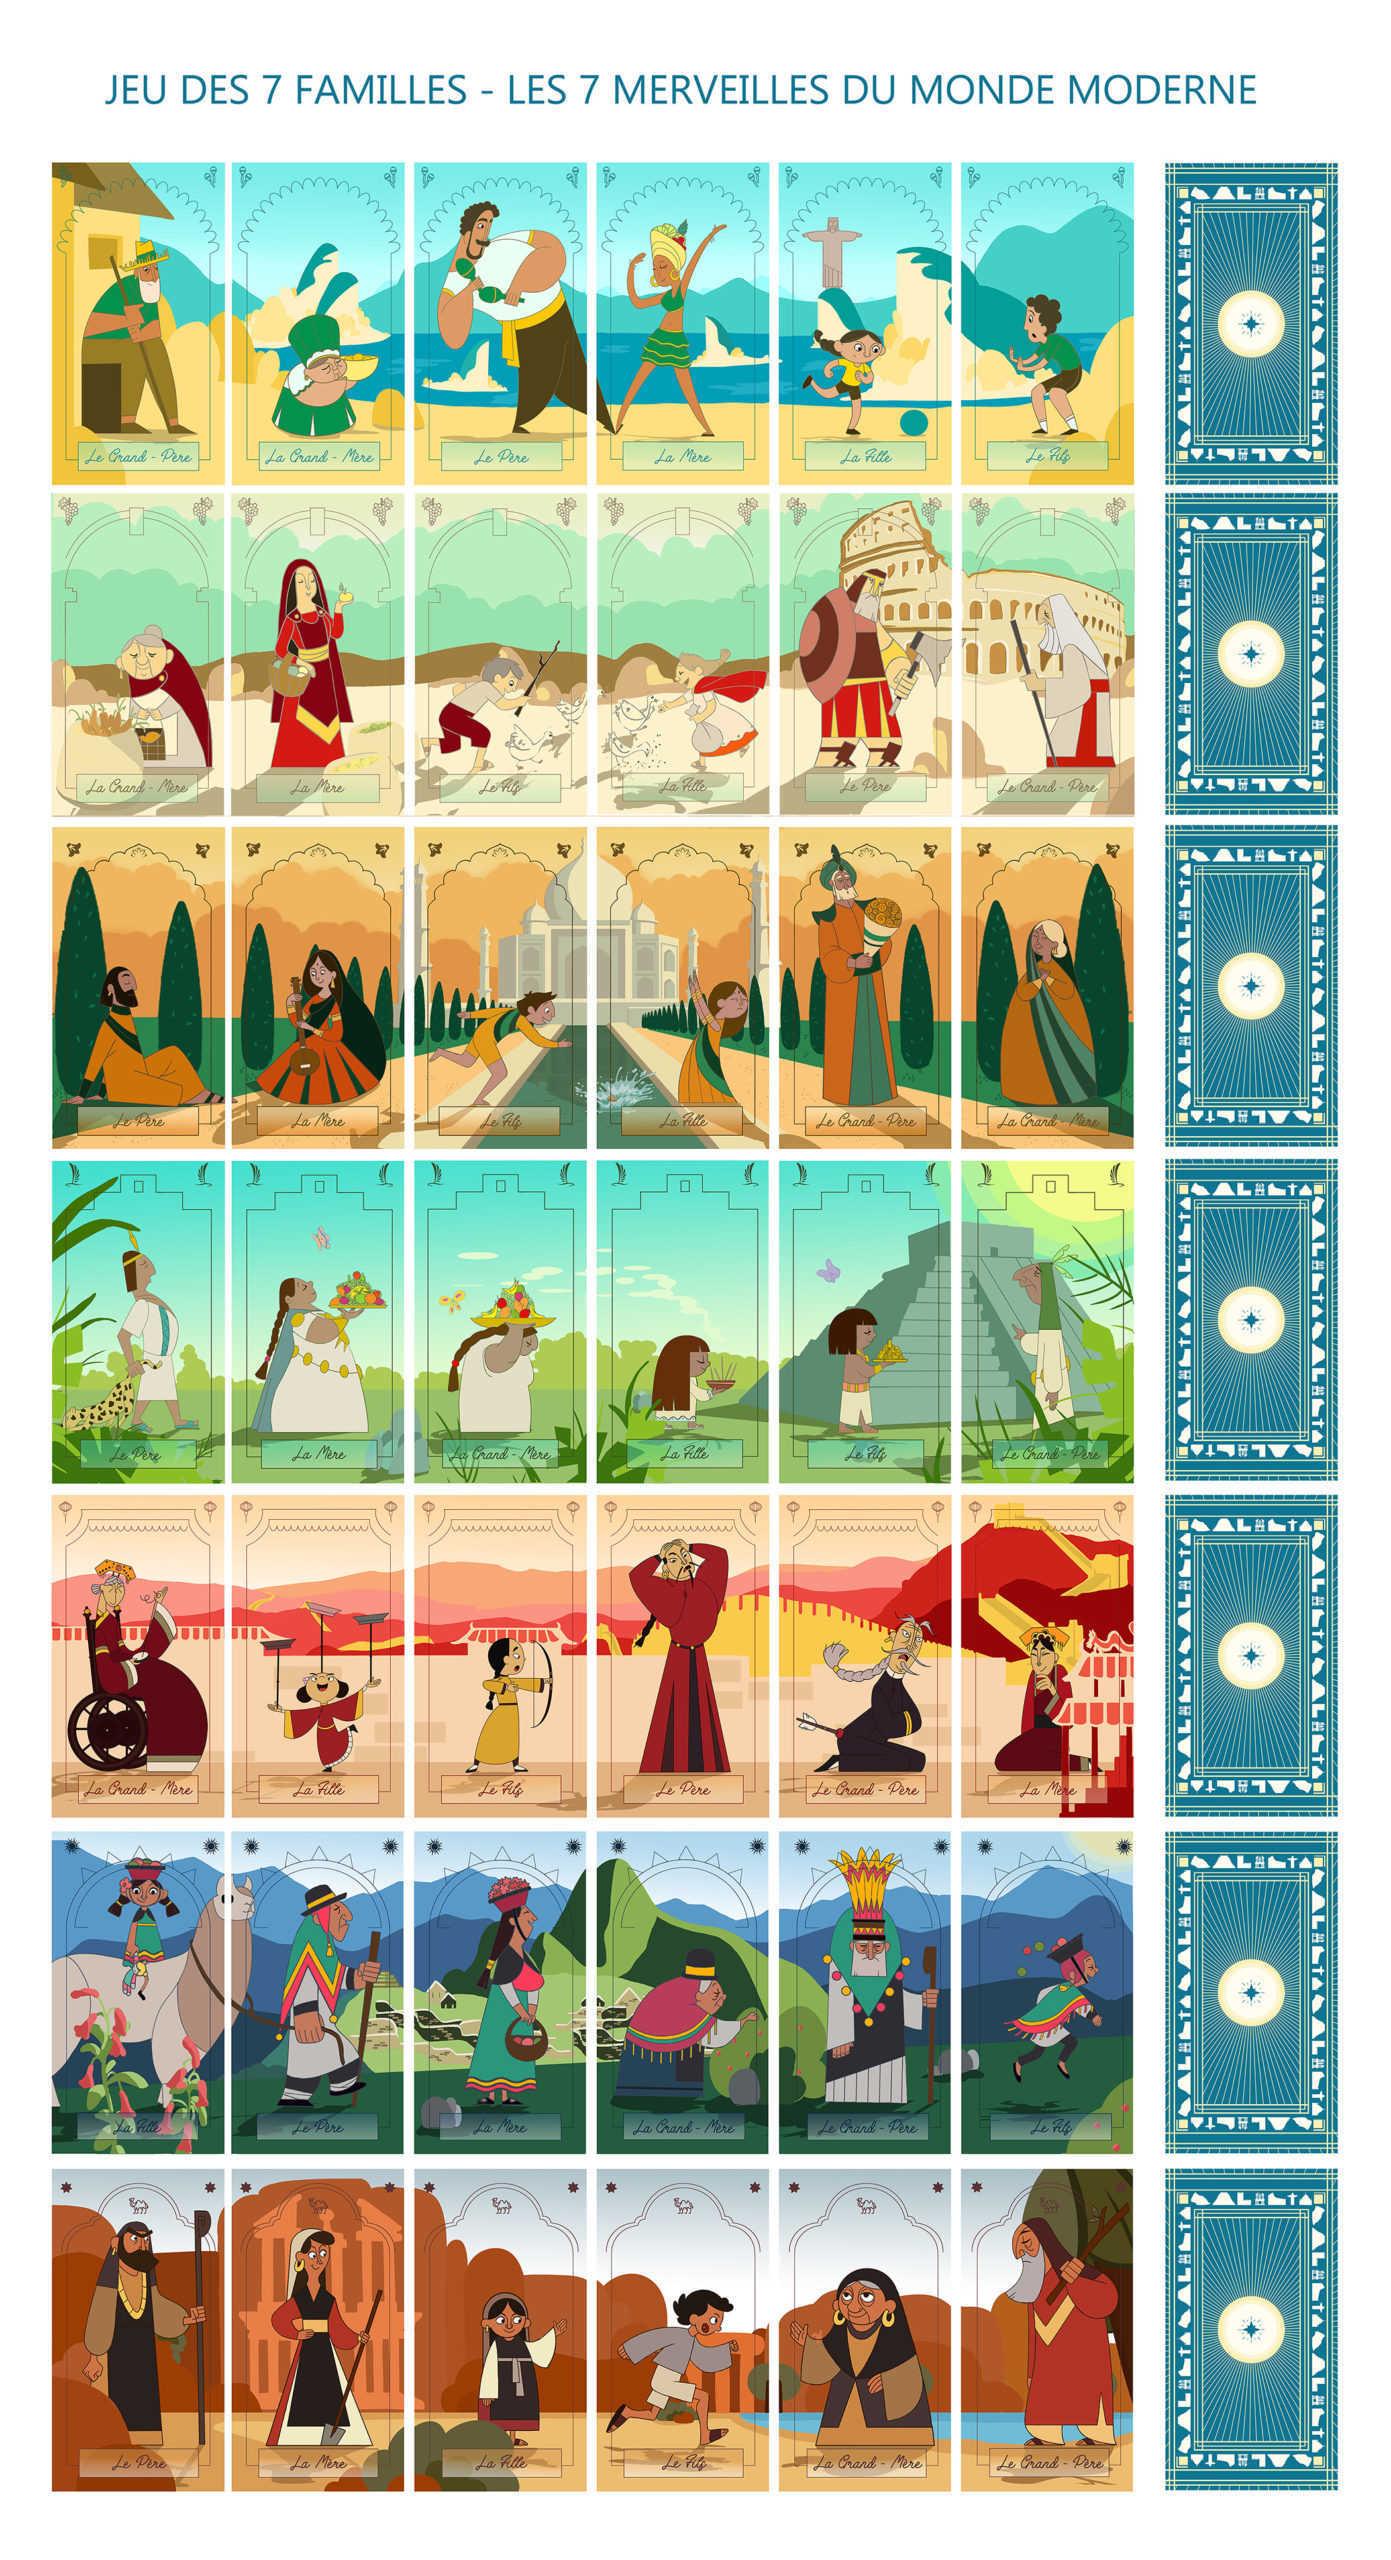 jeu-7-familles-merveilles-1b-scaled.jpg